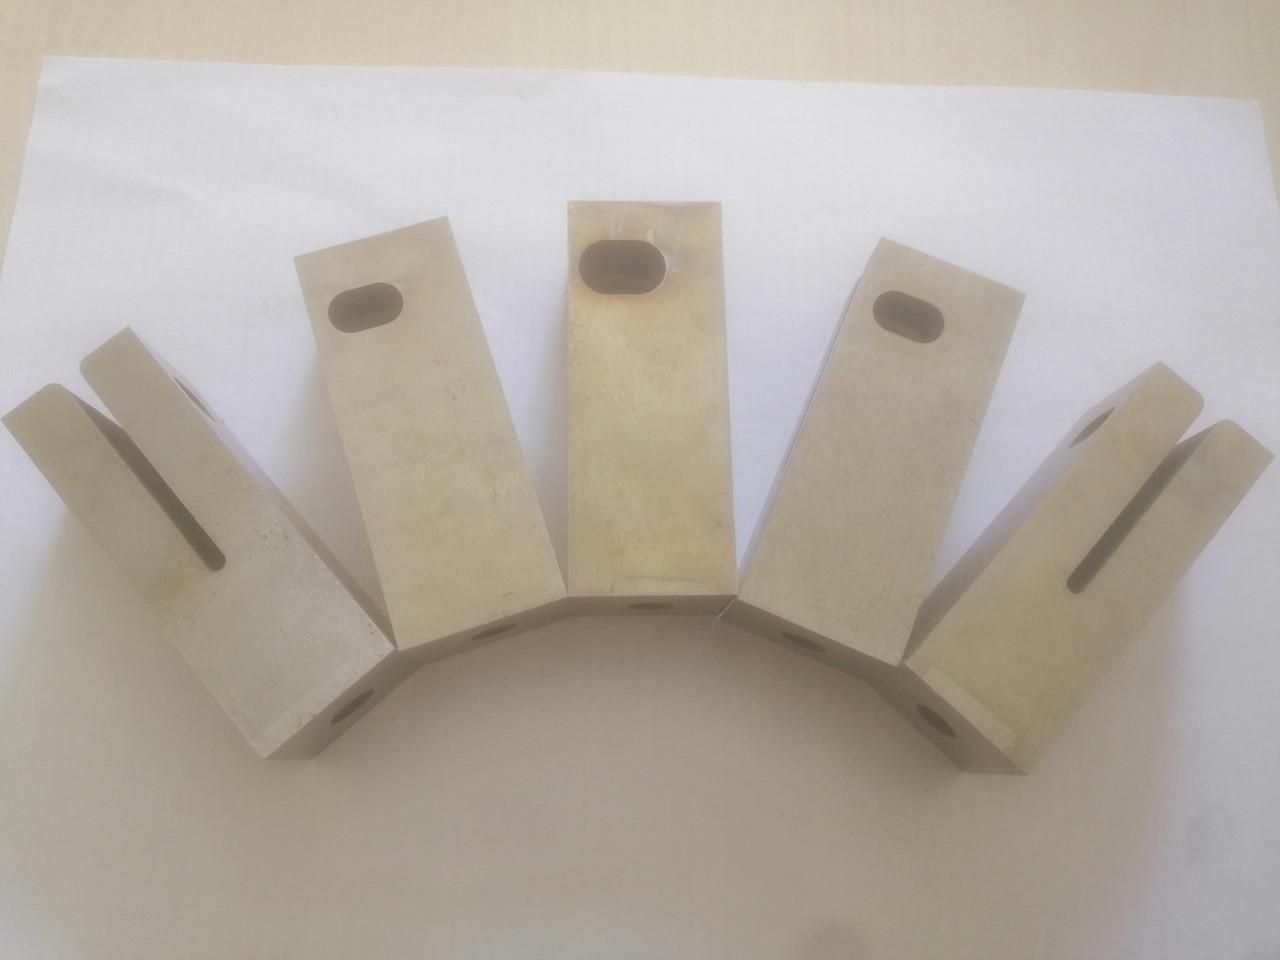 Матрицы  дыропробивные штампа окно 14,5 х 9